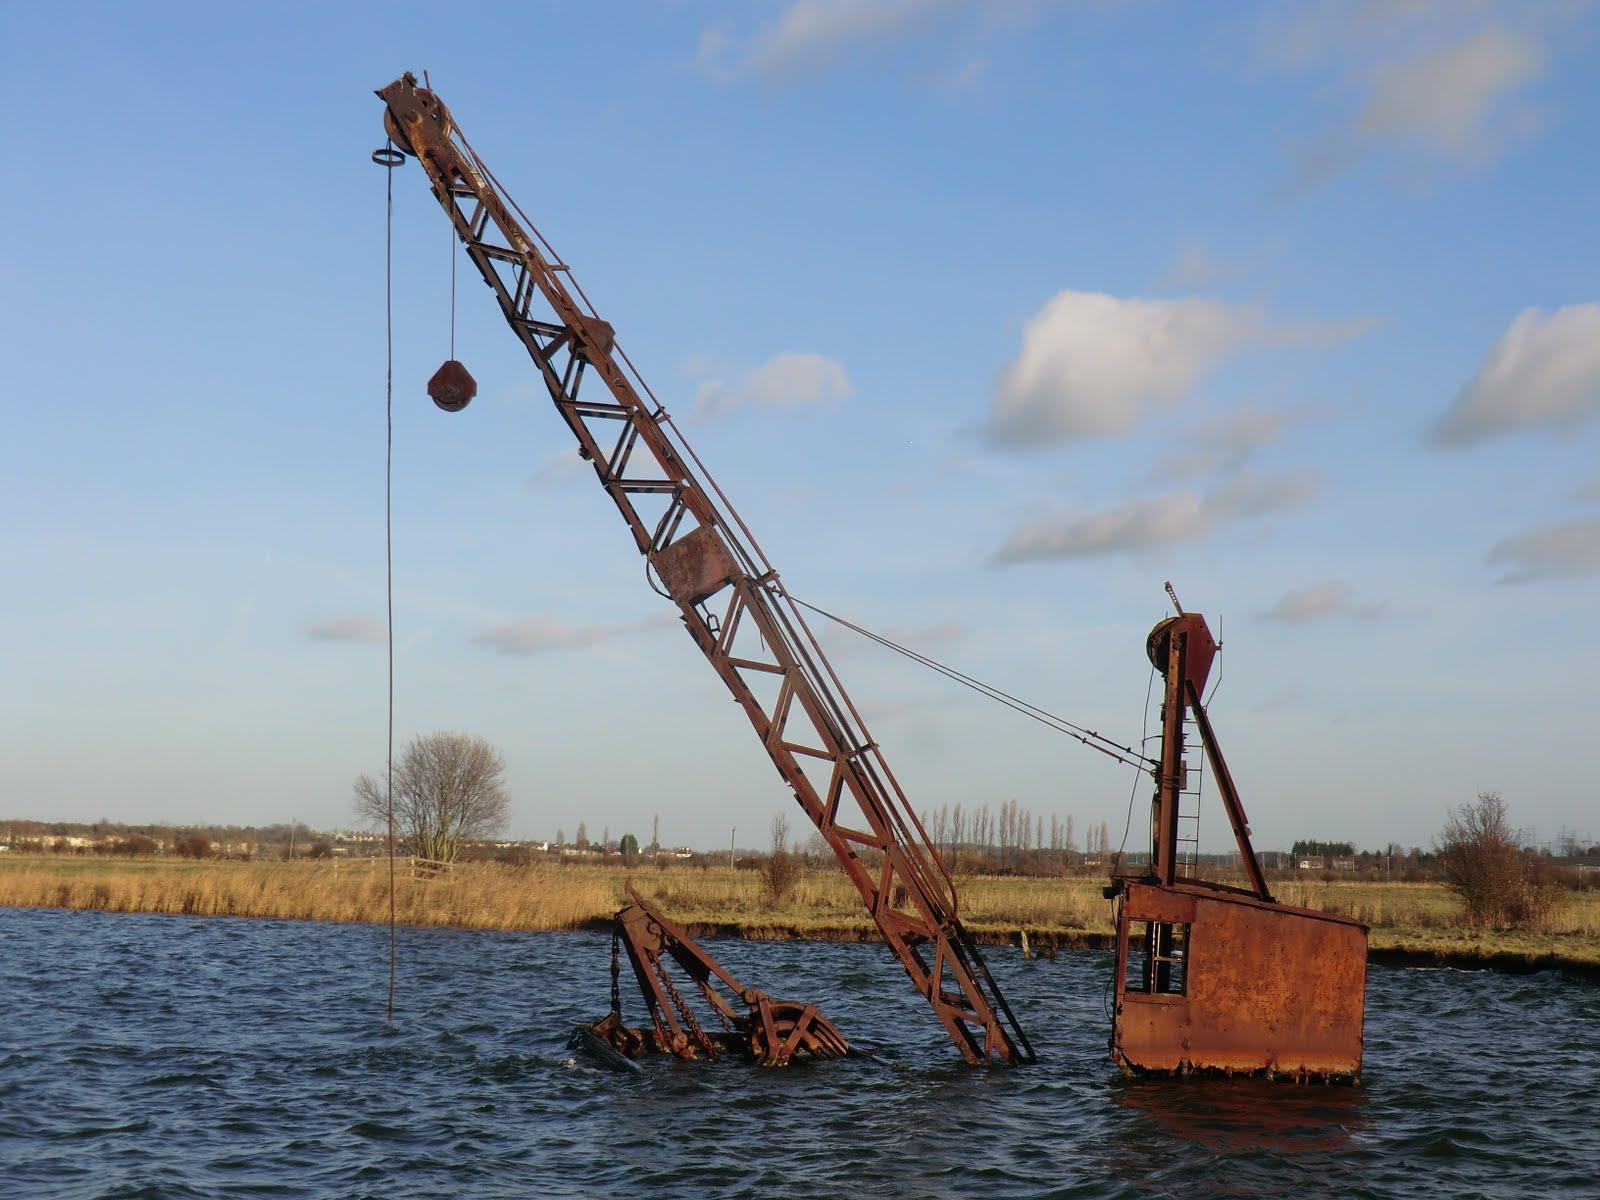 CIMG6641 Abandoned crane